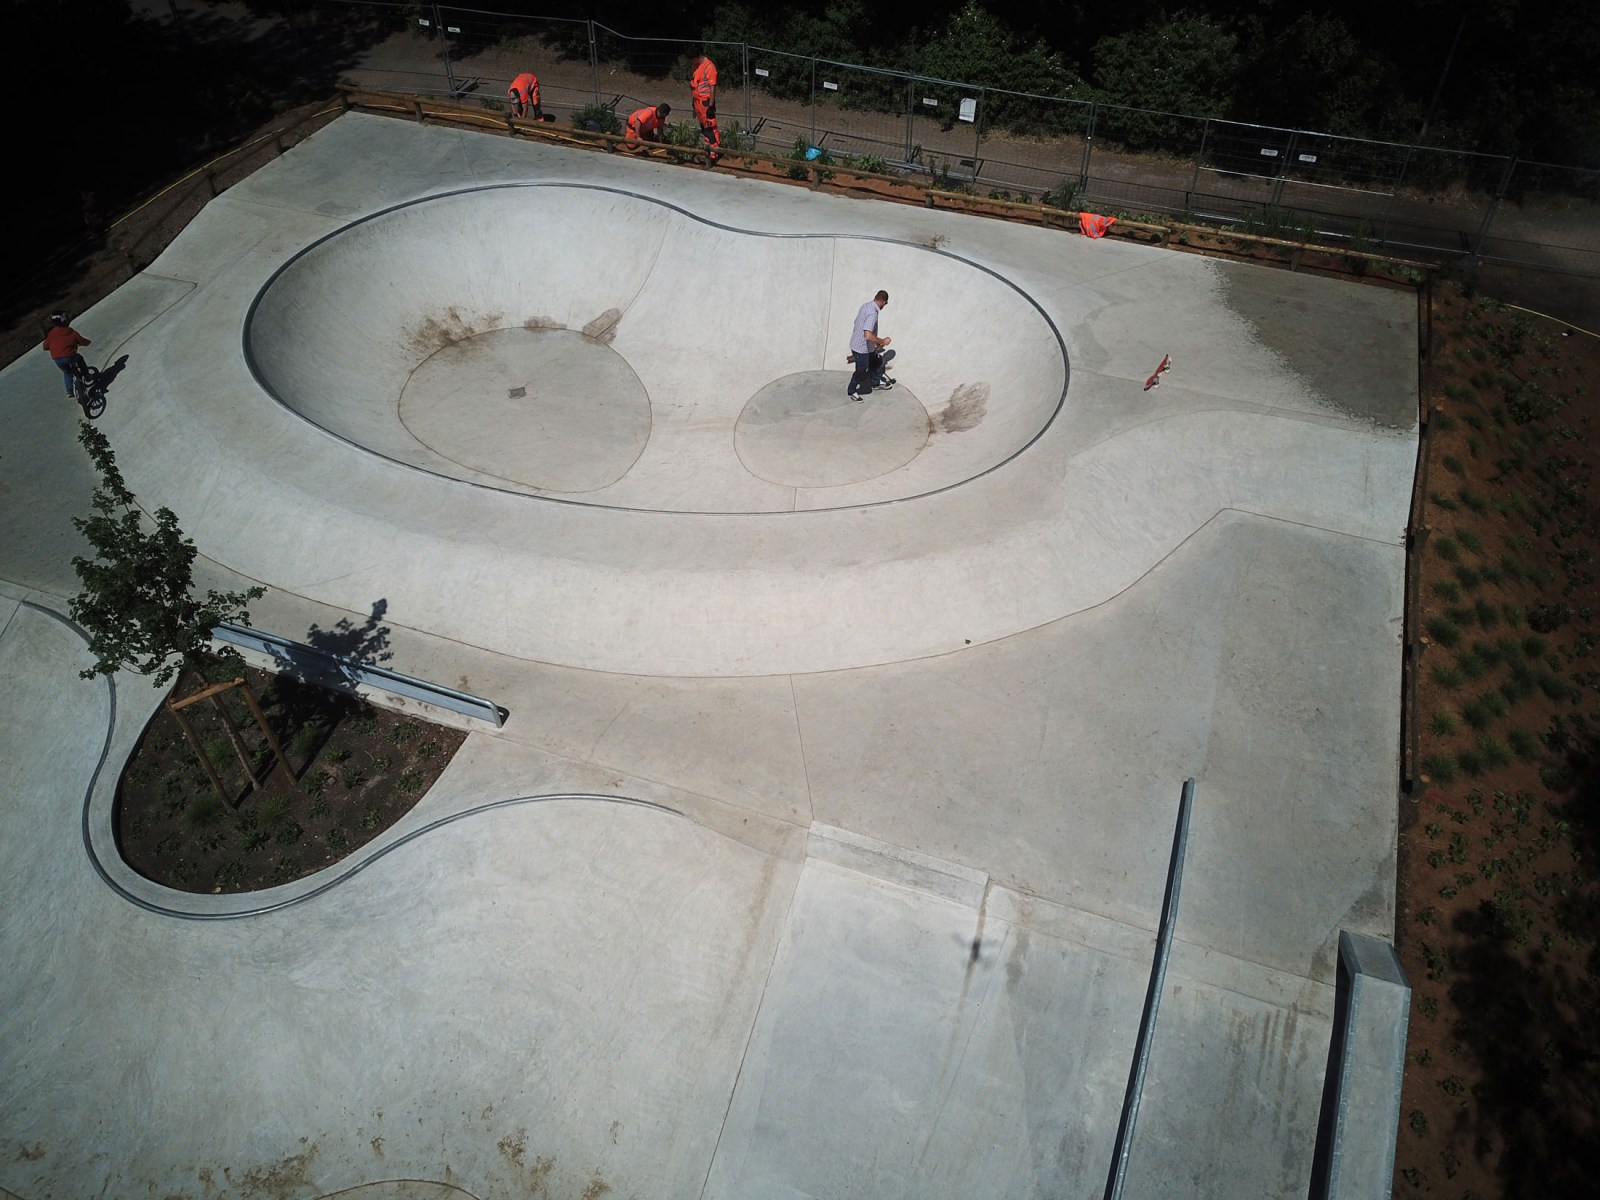 Skatepark_Sonsbeck_05.20_07